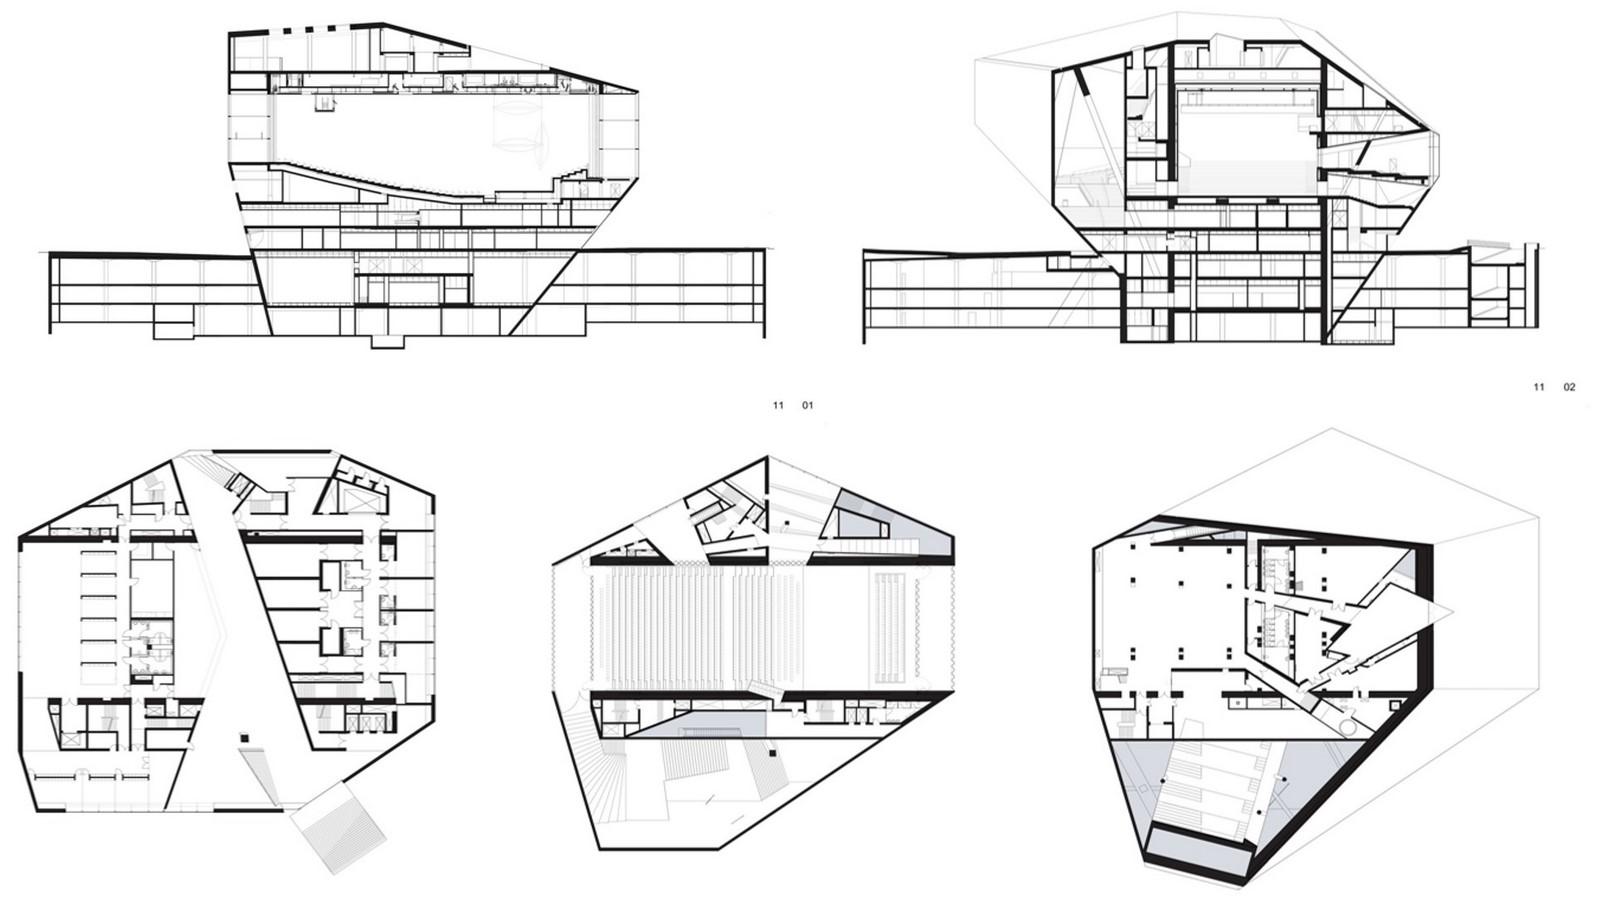 Casa Da Musica, Porto by Rem Koolhaas: The Asymmetrical Polyhedron - Sheet12